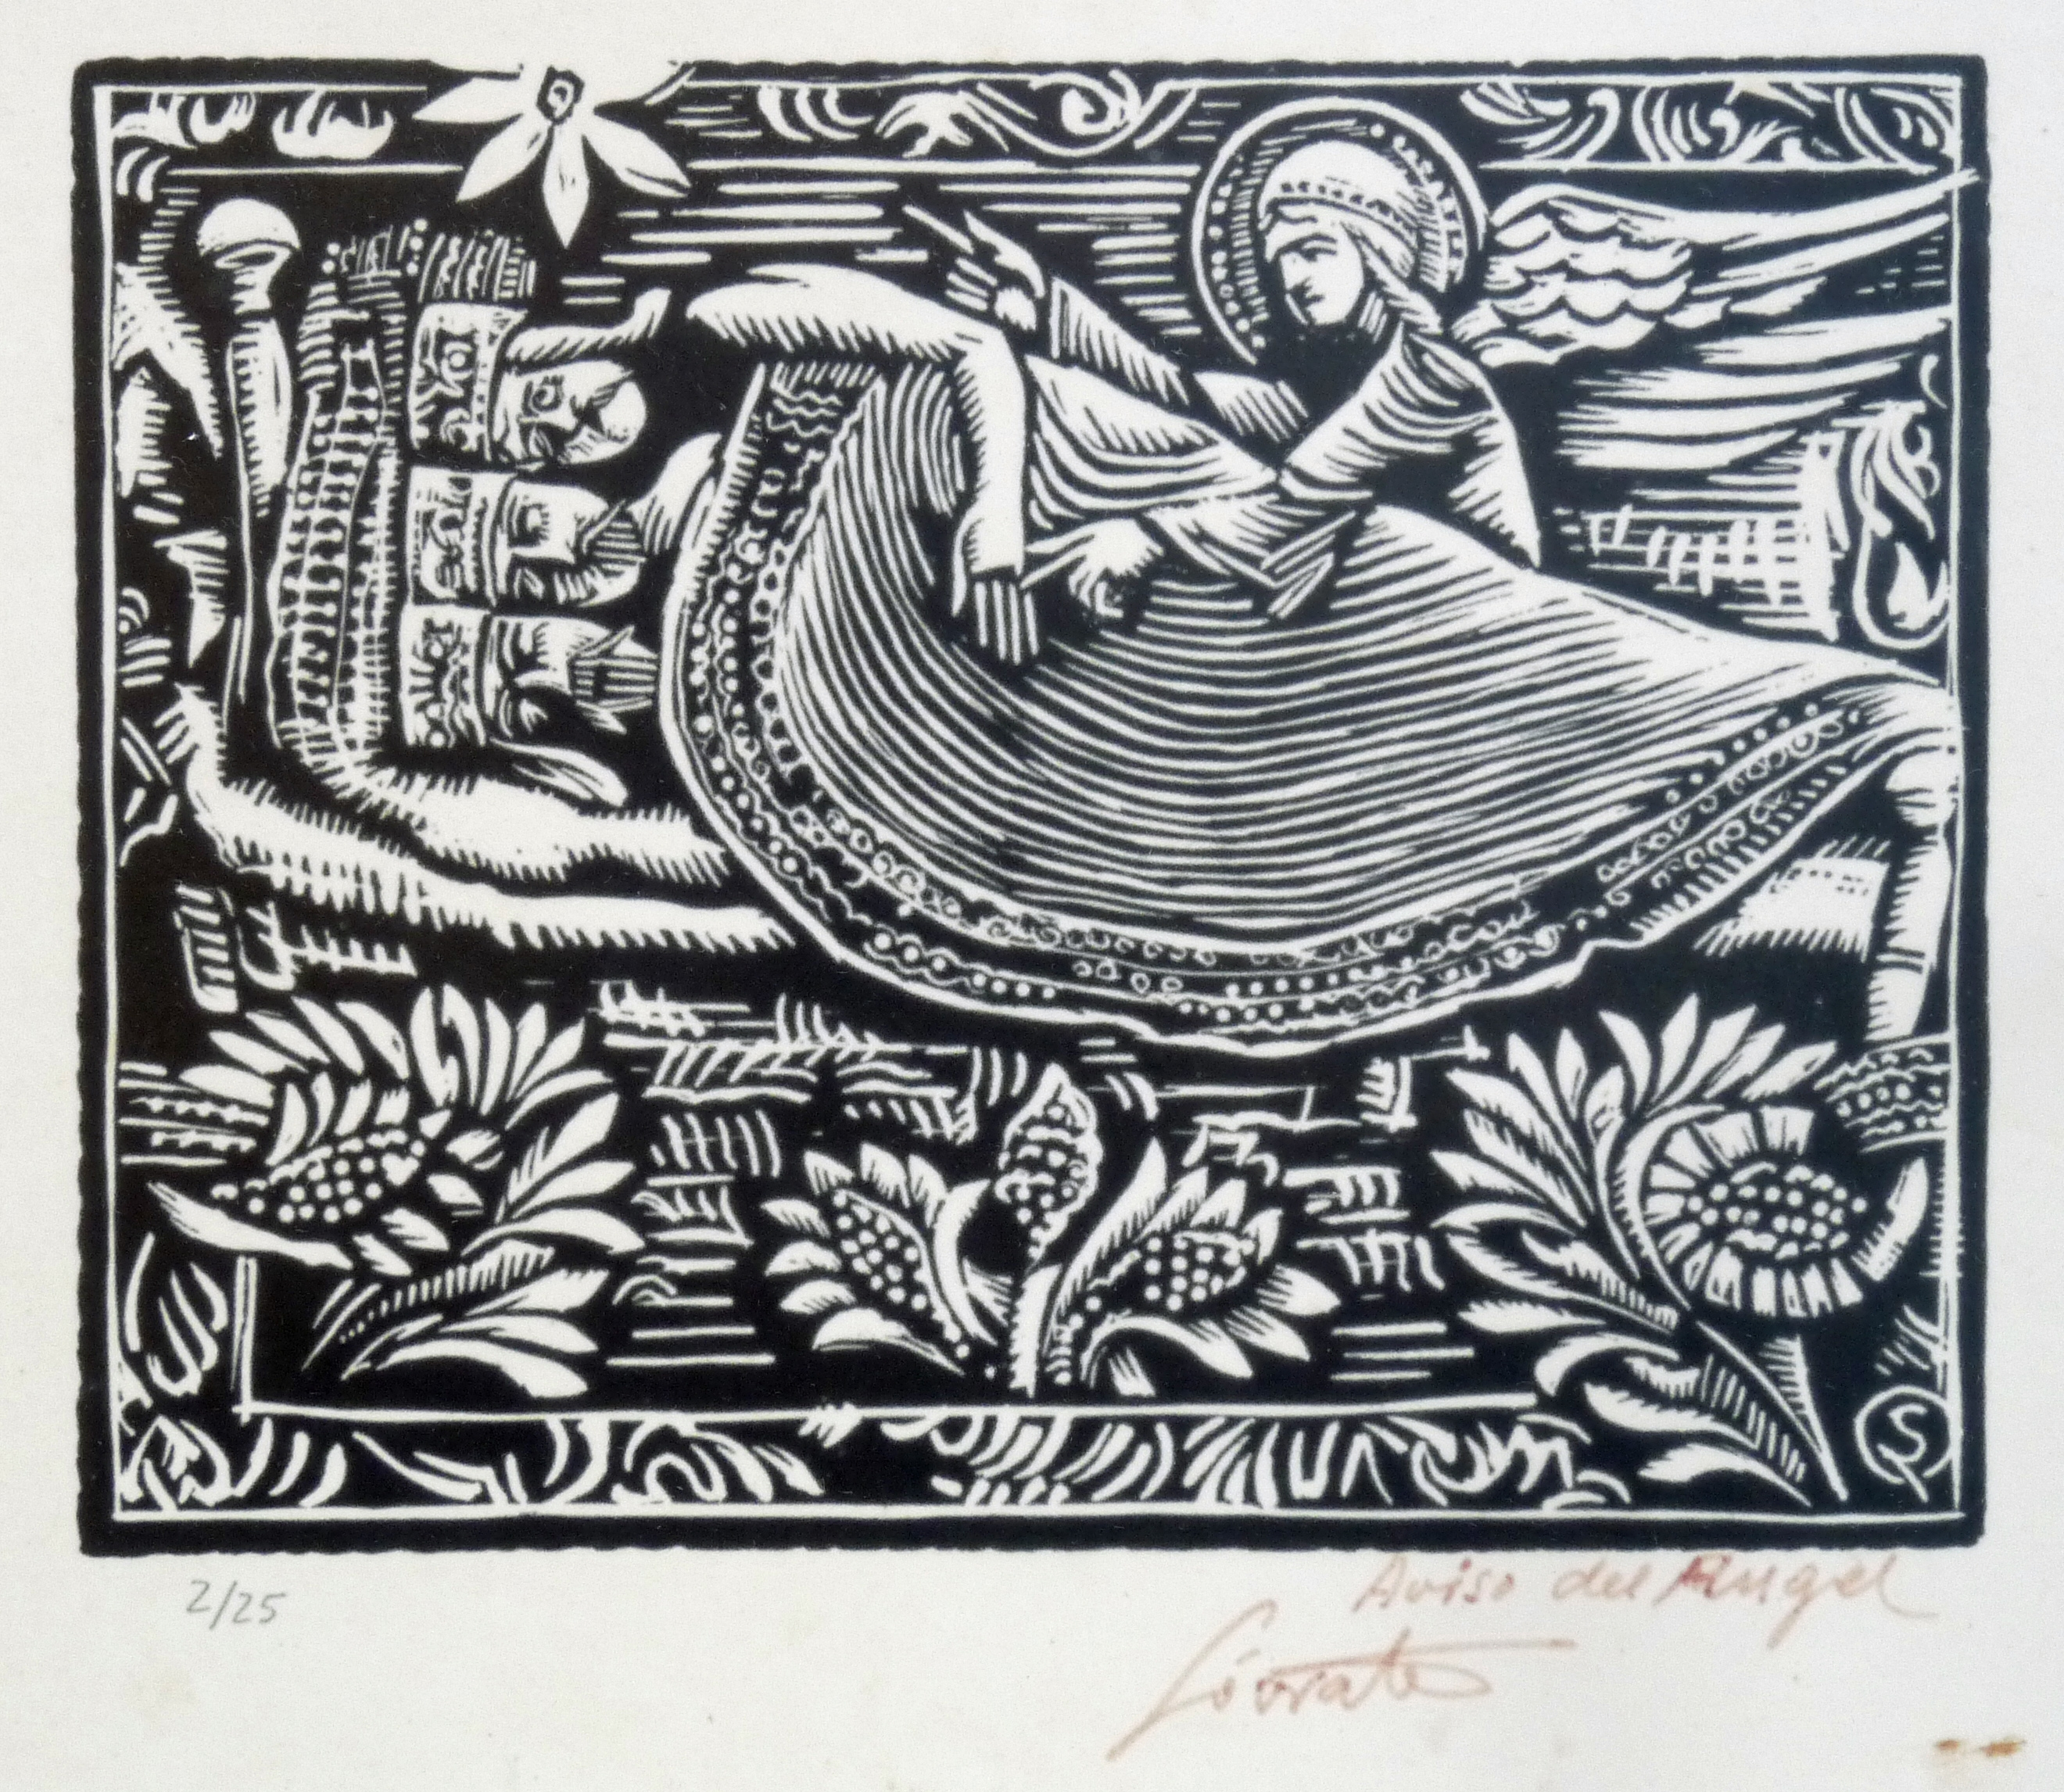 Aviso del Ángel | Sócrates Quintana (Xilografía 0,33x0,27)